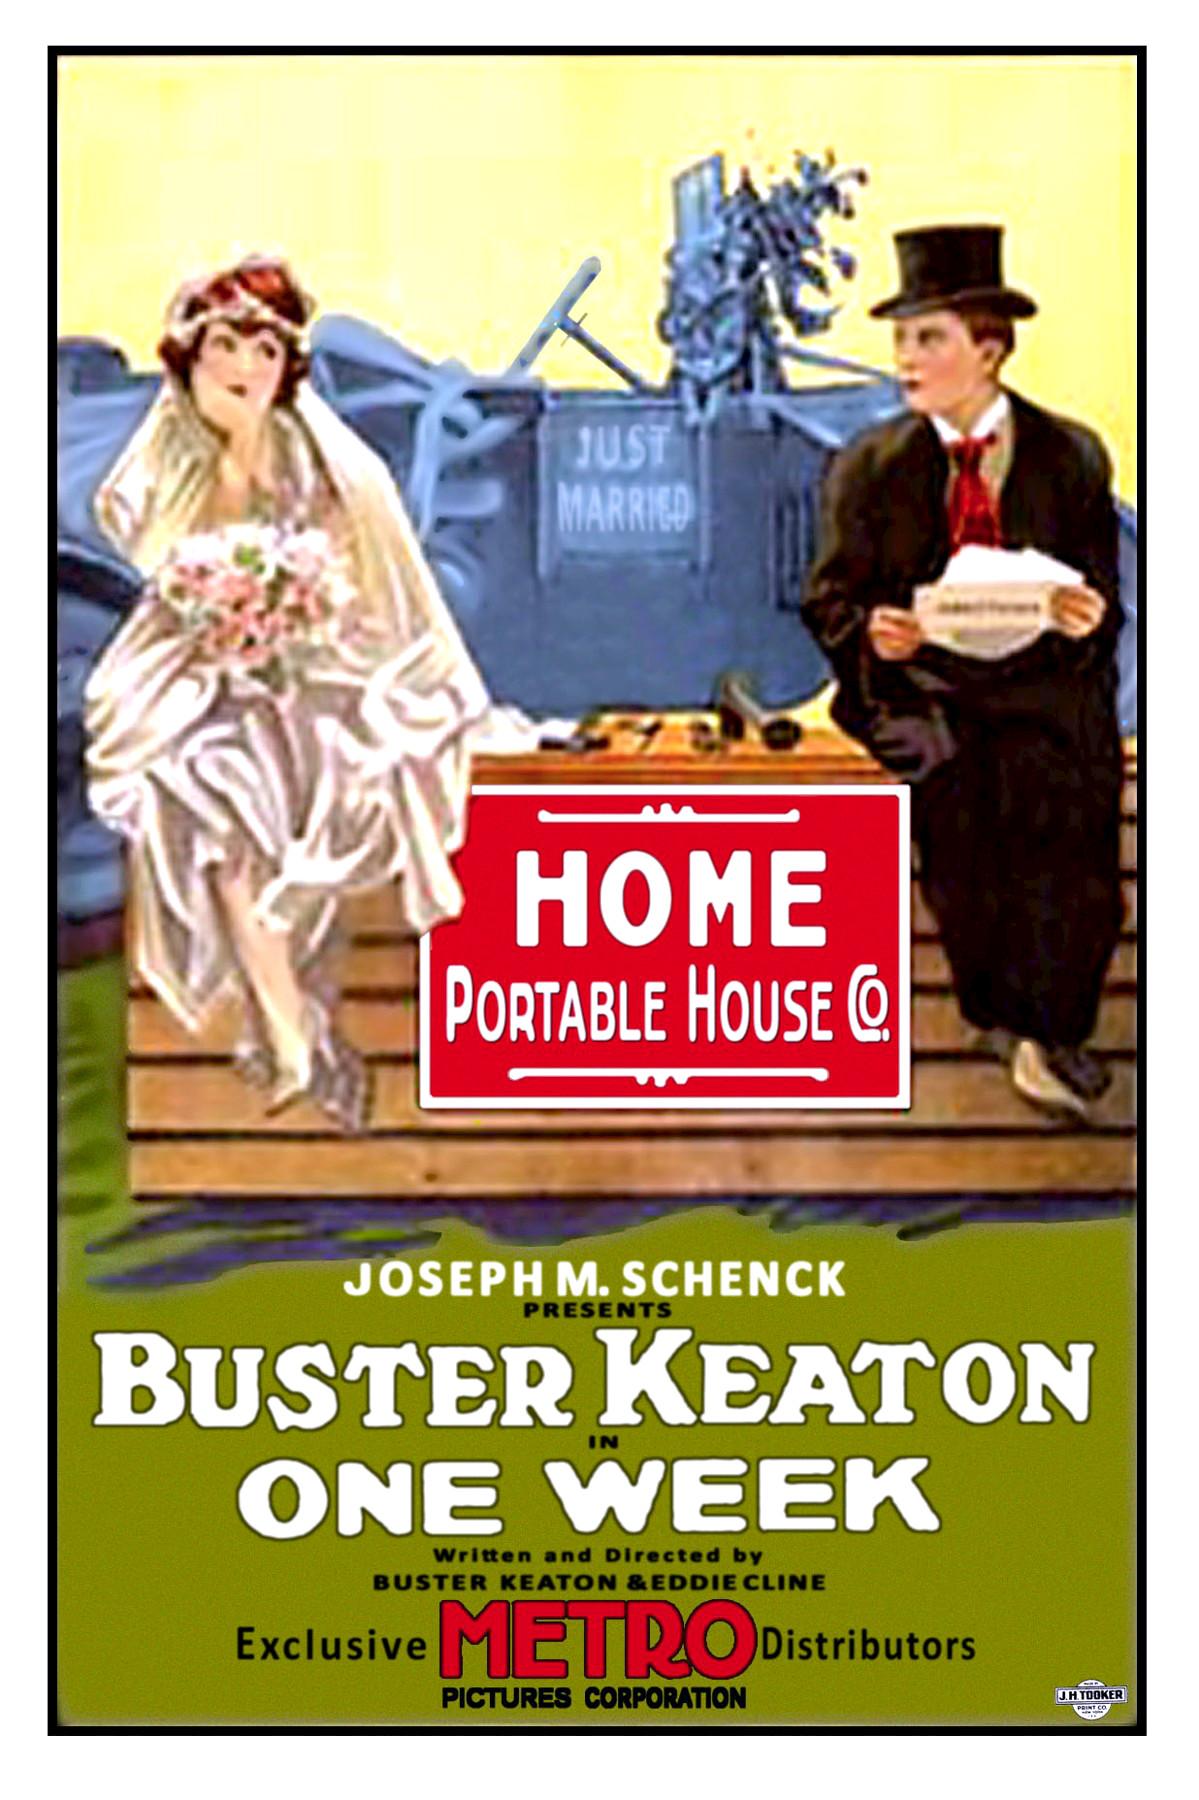 https commons wikimedia org wiki file buster keaton one week poster jpg